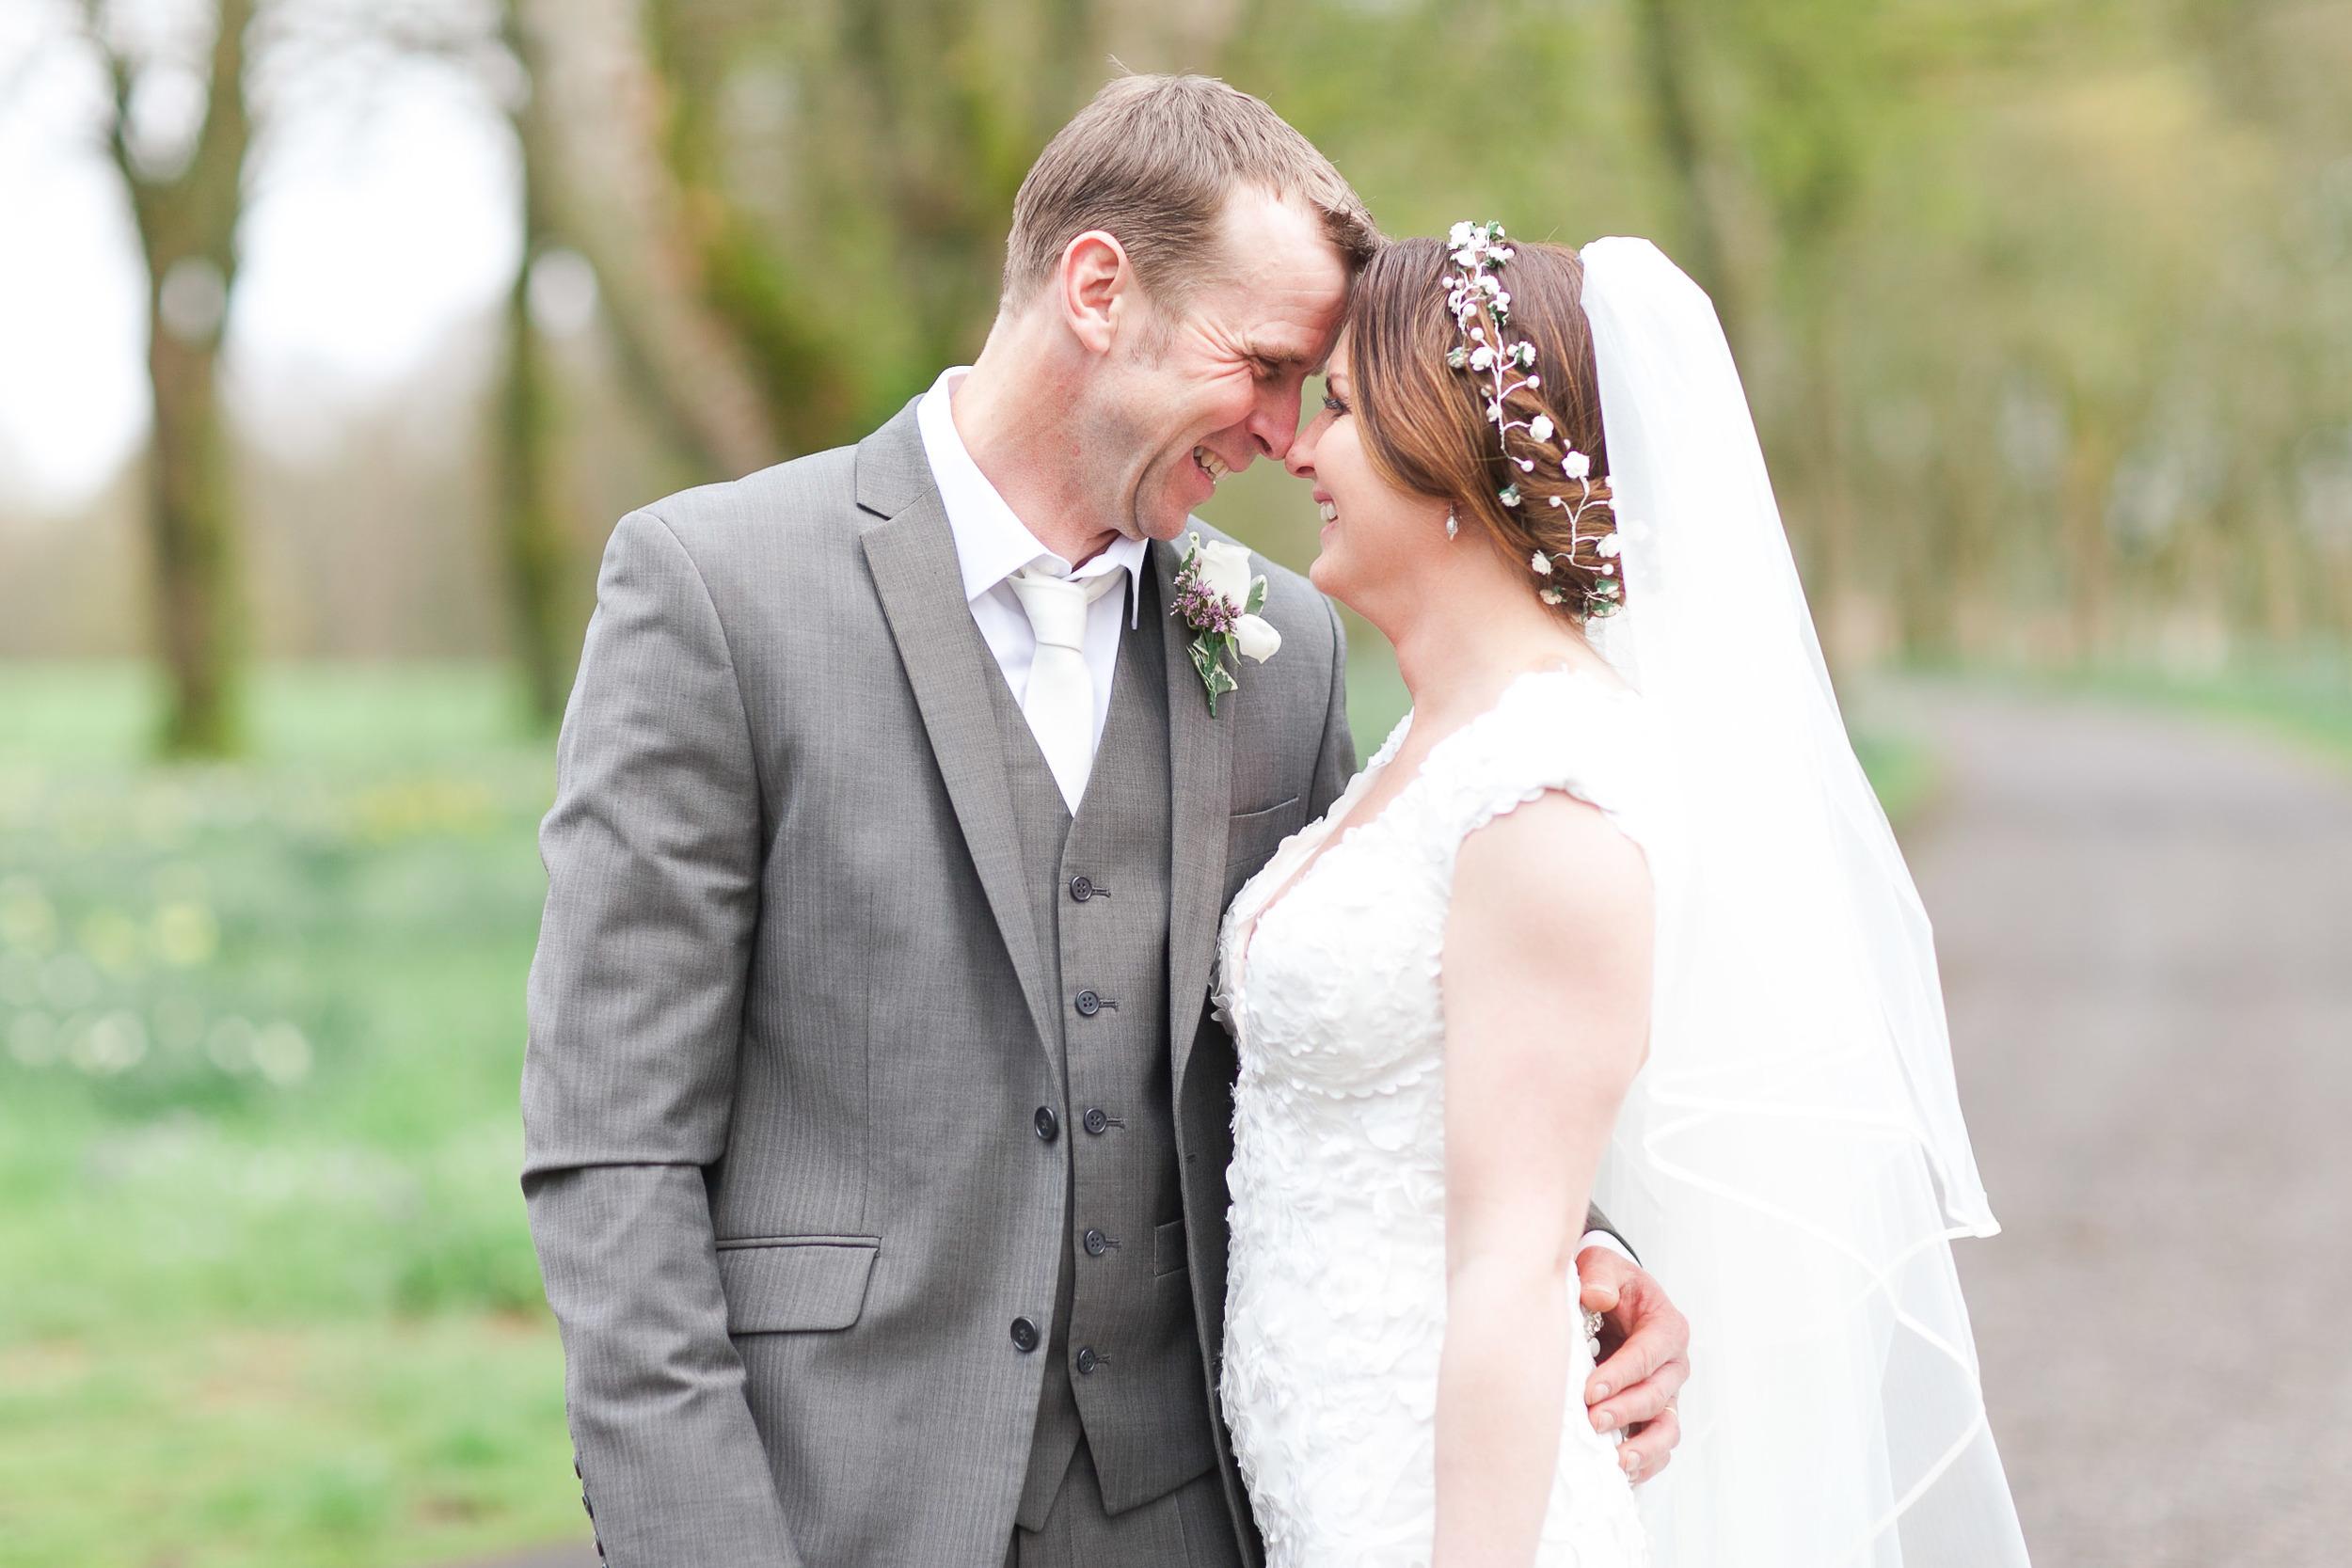 Ireland-Kildare-Wedding-Photographer-0019.jpg